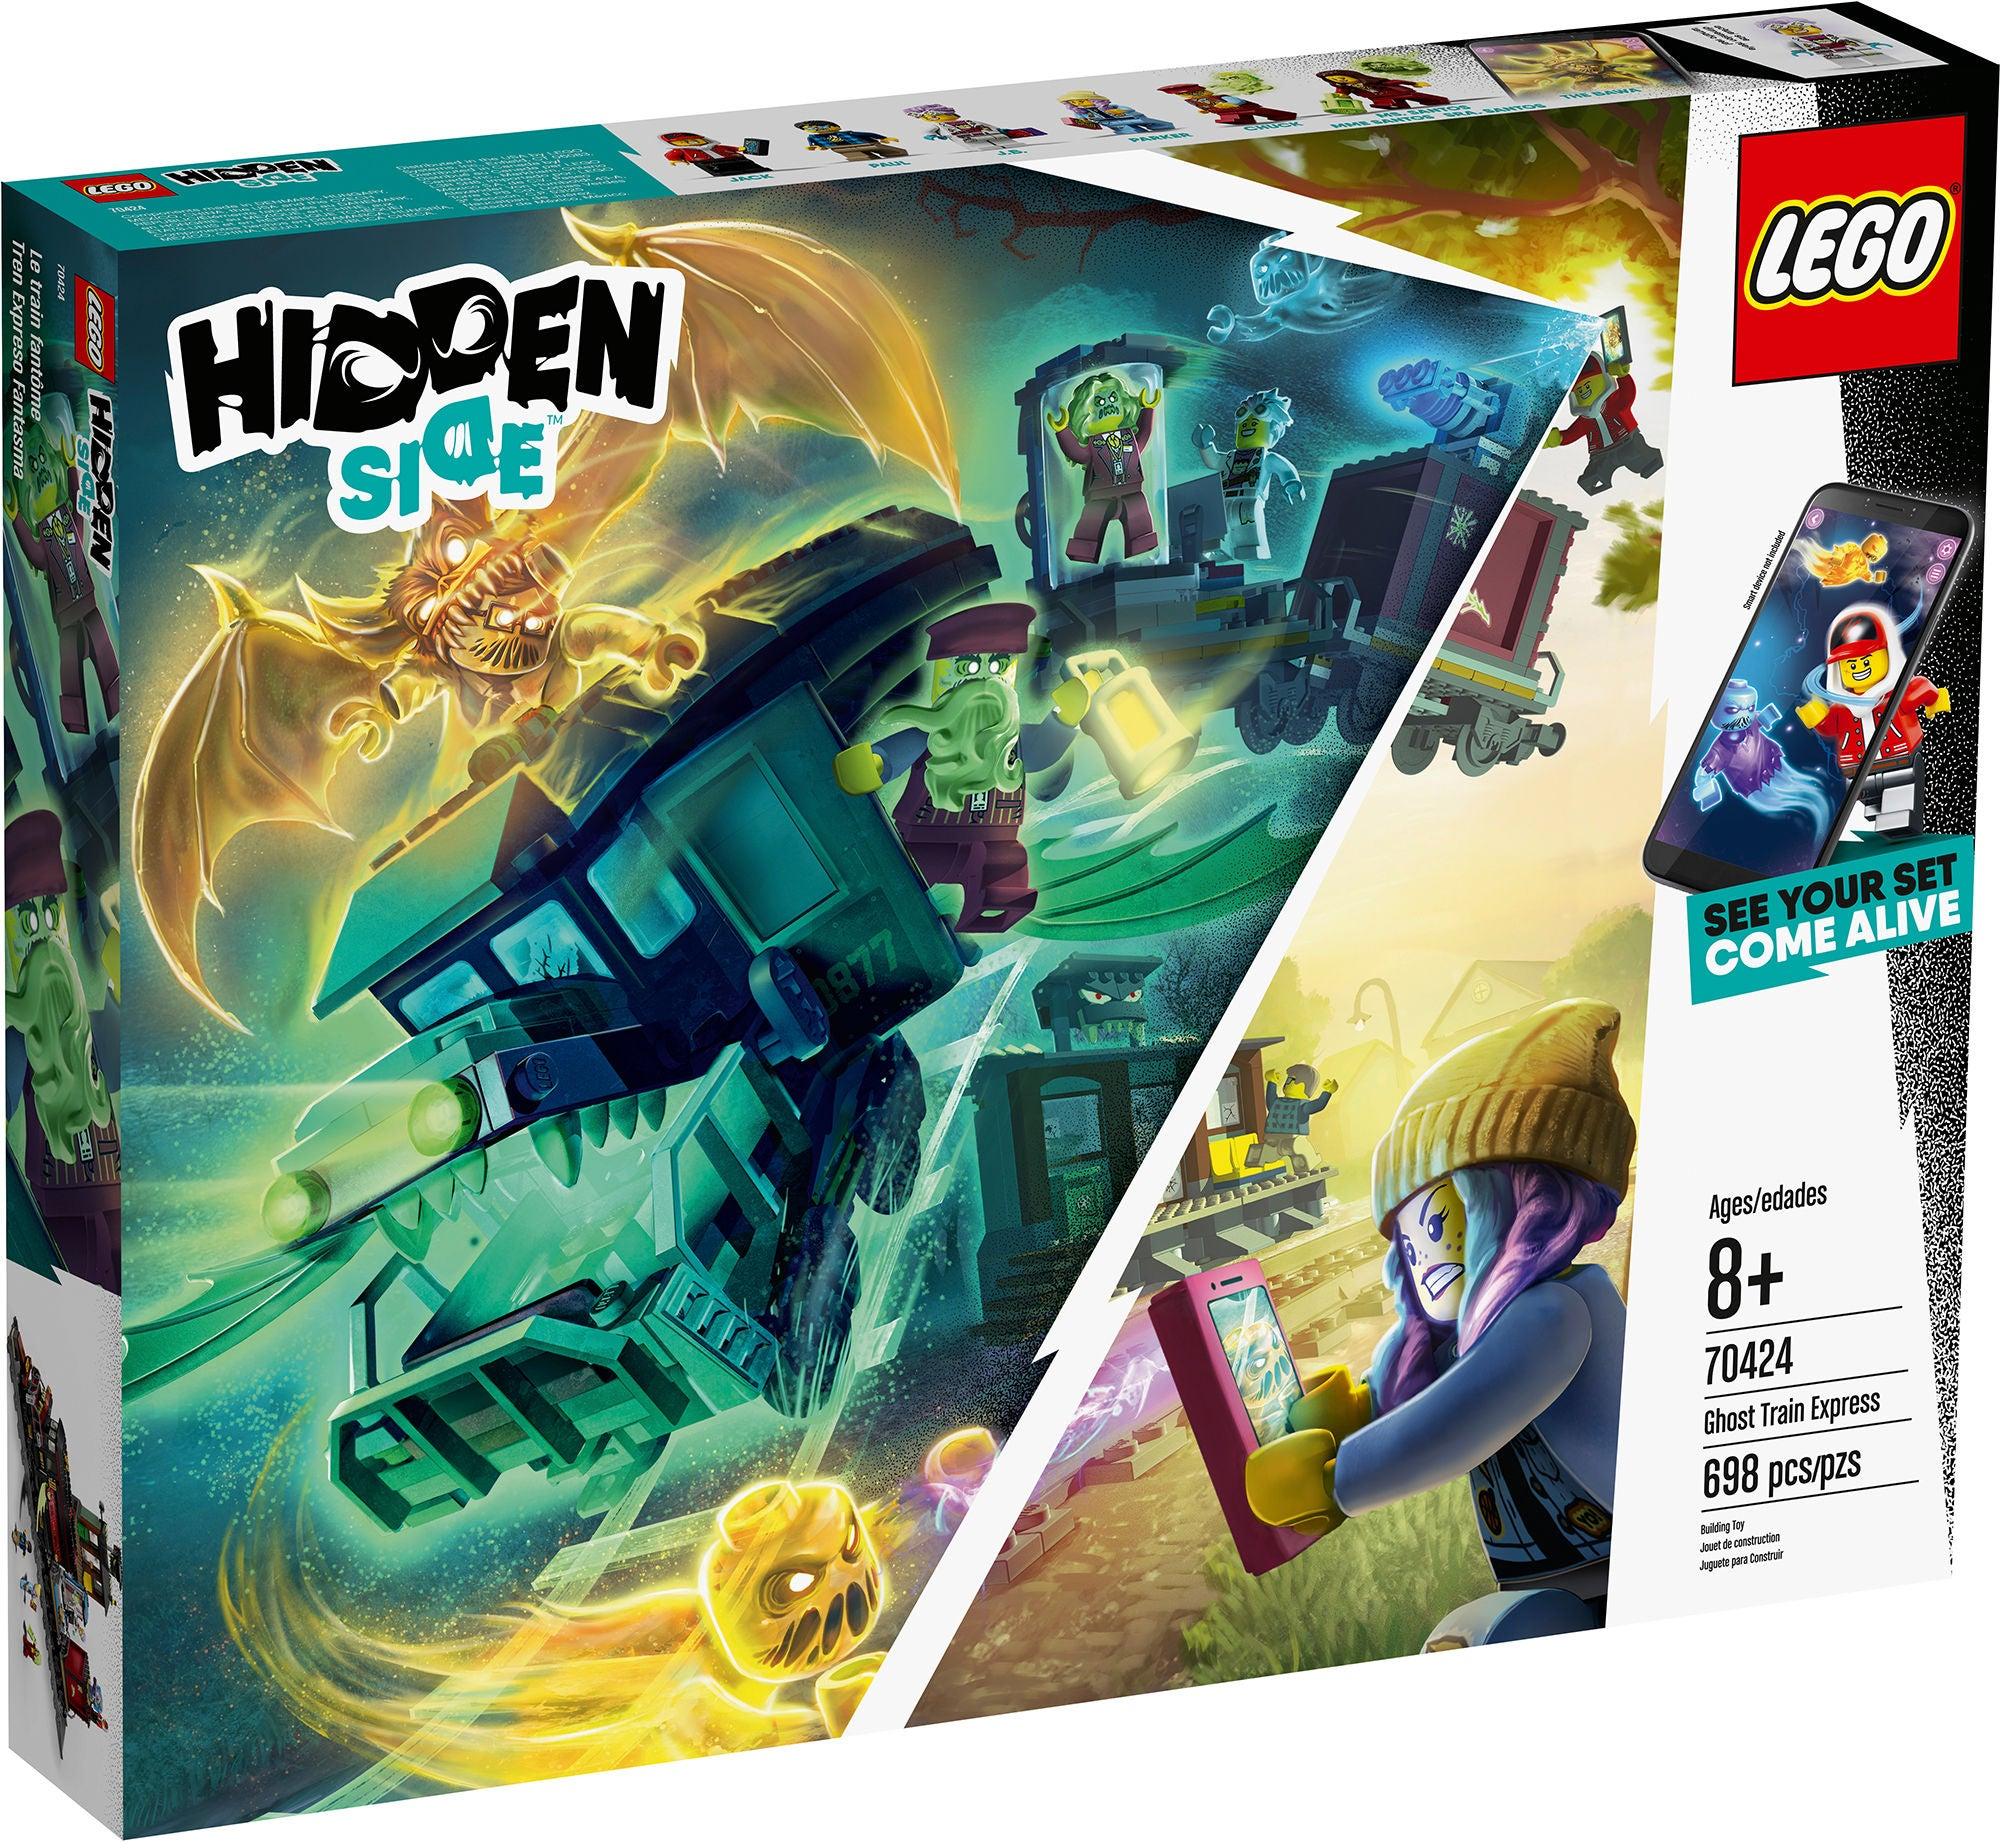 Lego Förvaring Huvud Stort ~ Byggesett& Lego Stort utvalg byggesett& klosser Jollyroom